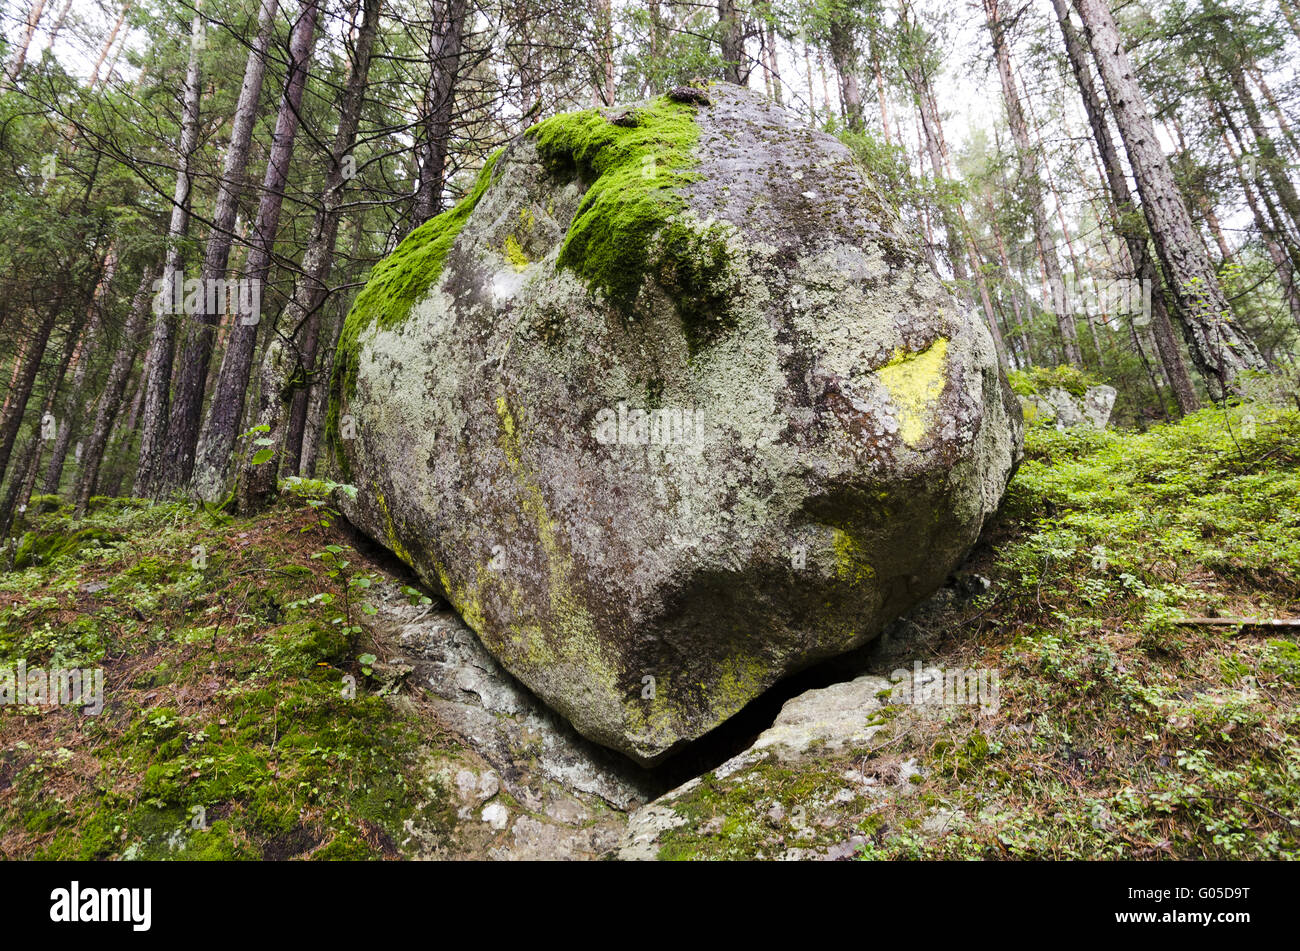 Rock near hiking trail - Stock Image